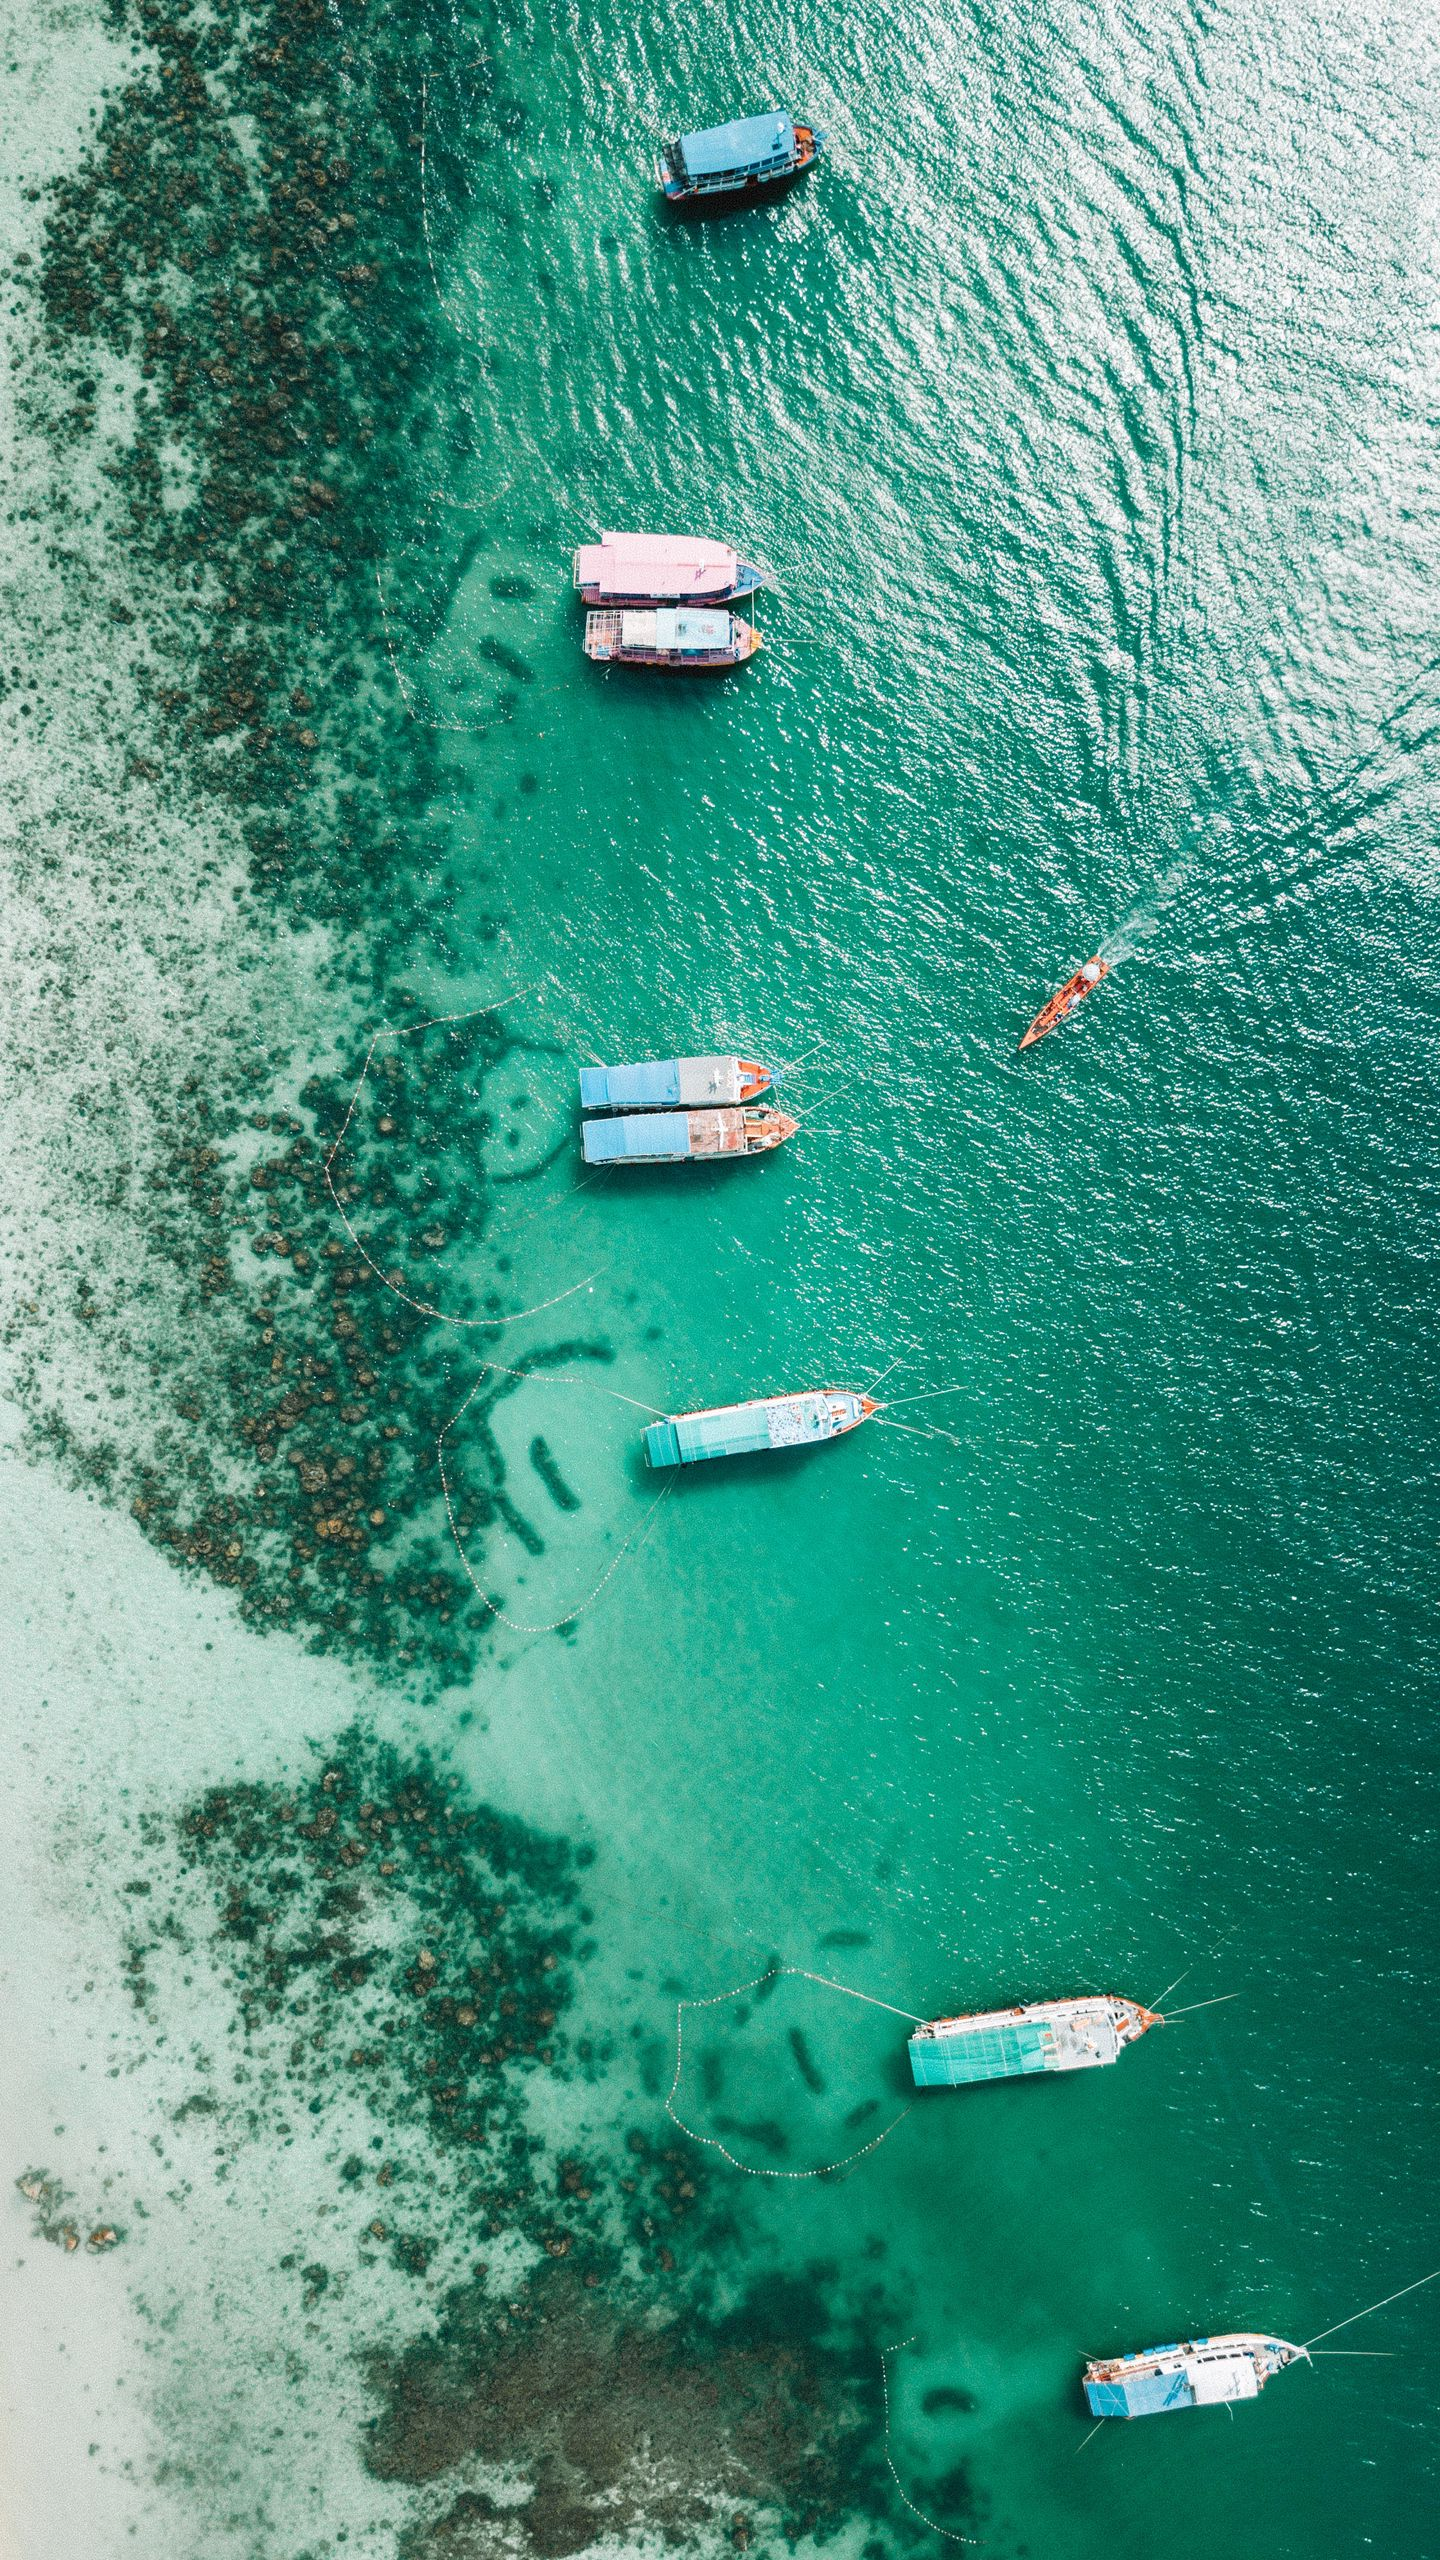 1440x2560 Wallpaper shore, boats, sandbar, ocean, moored, aerial view